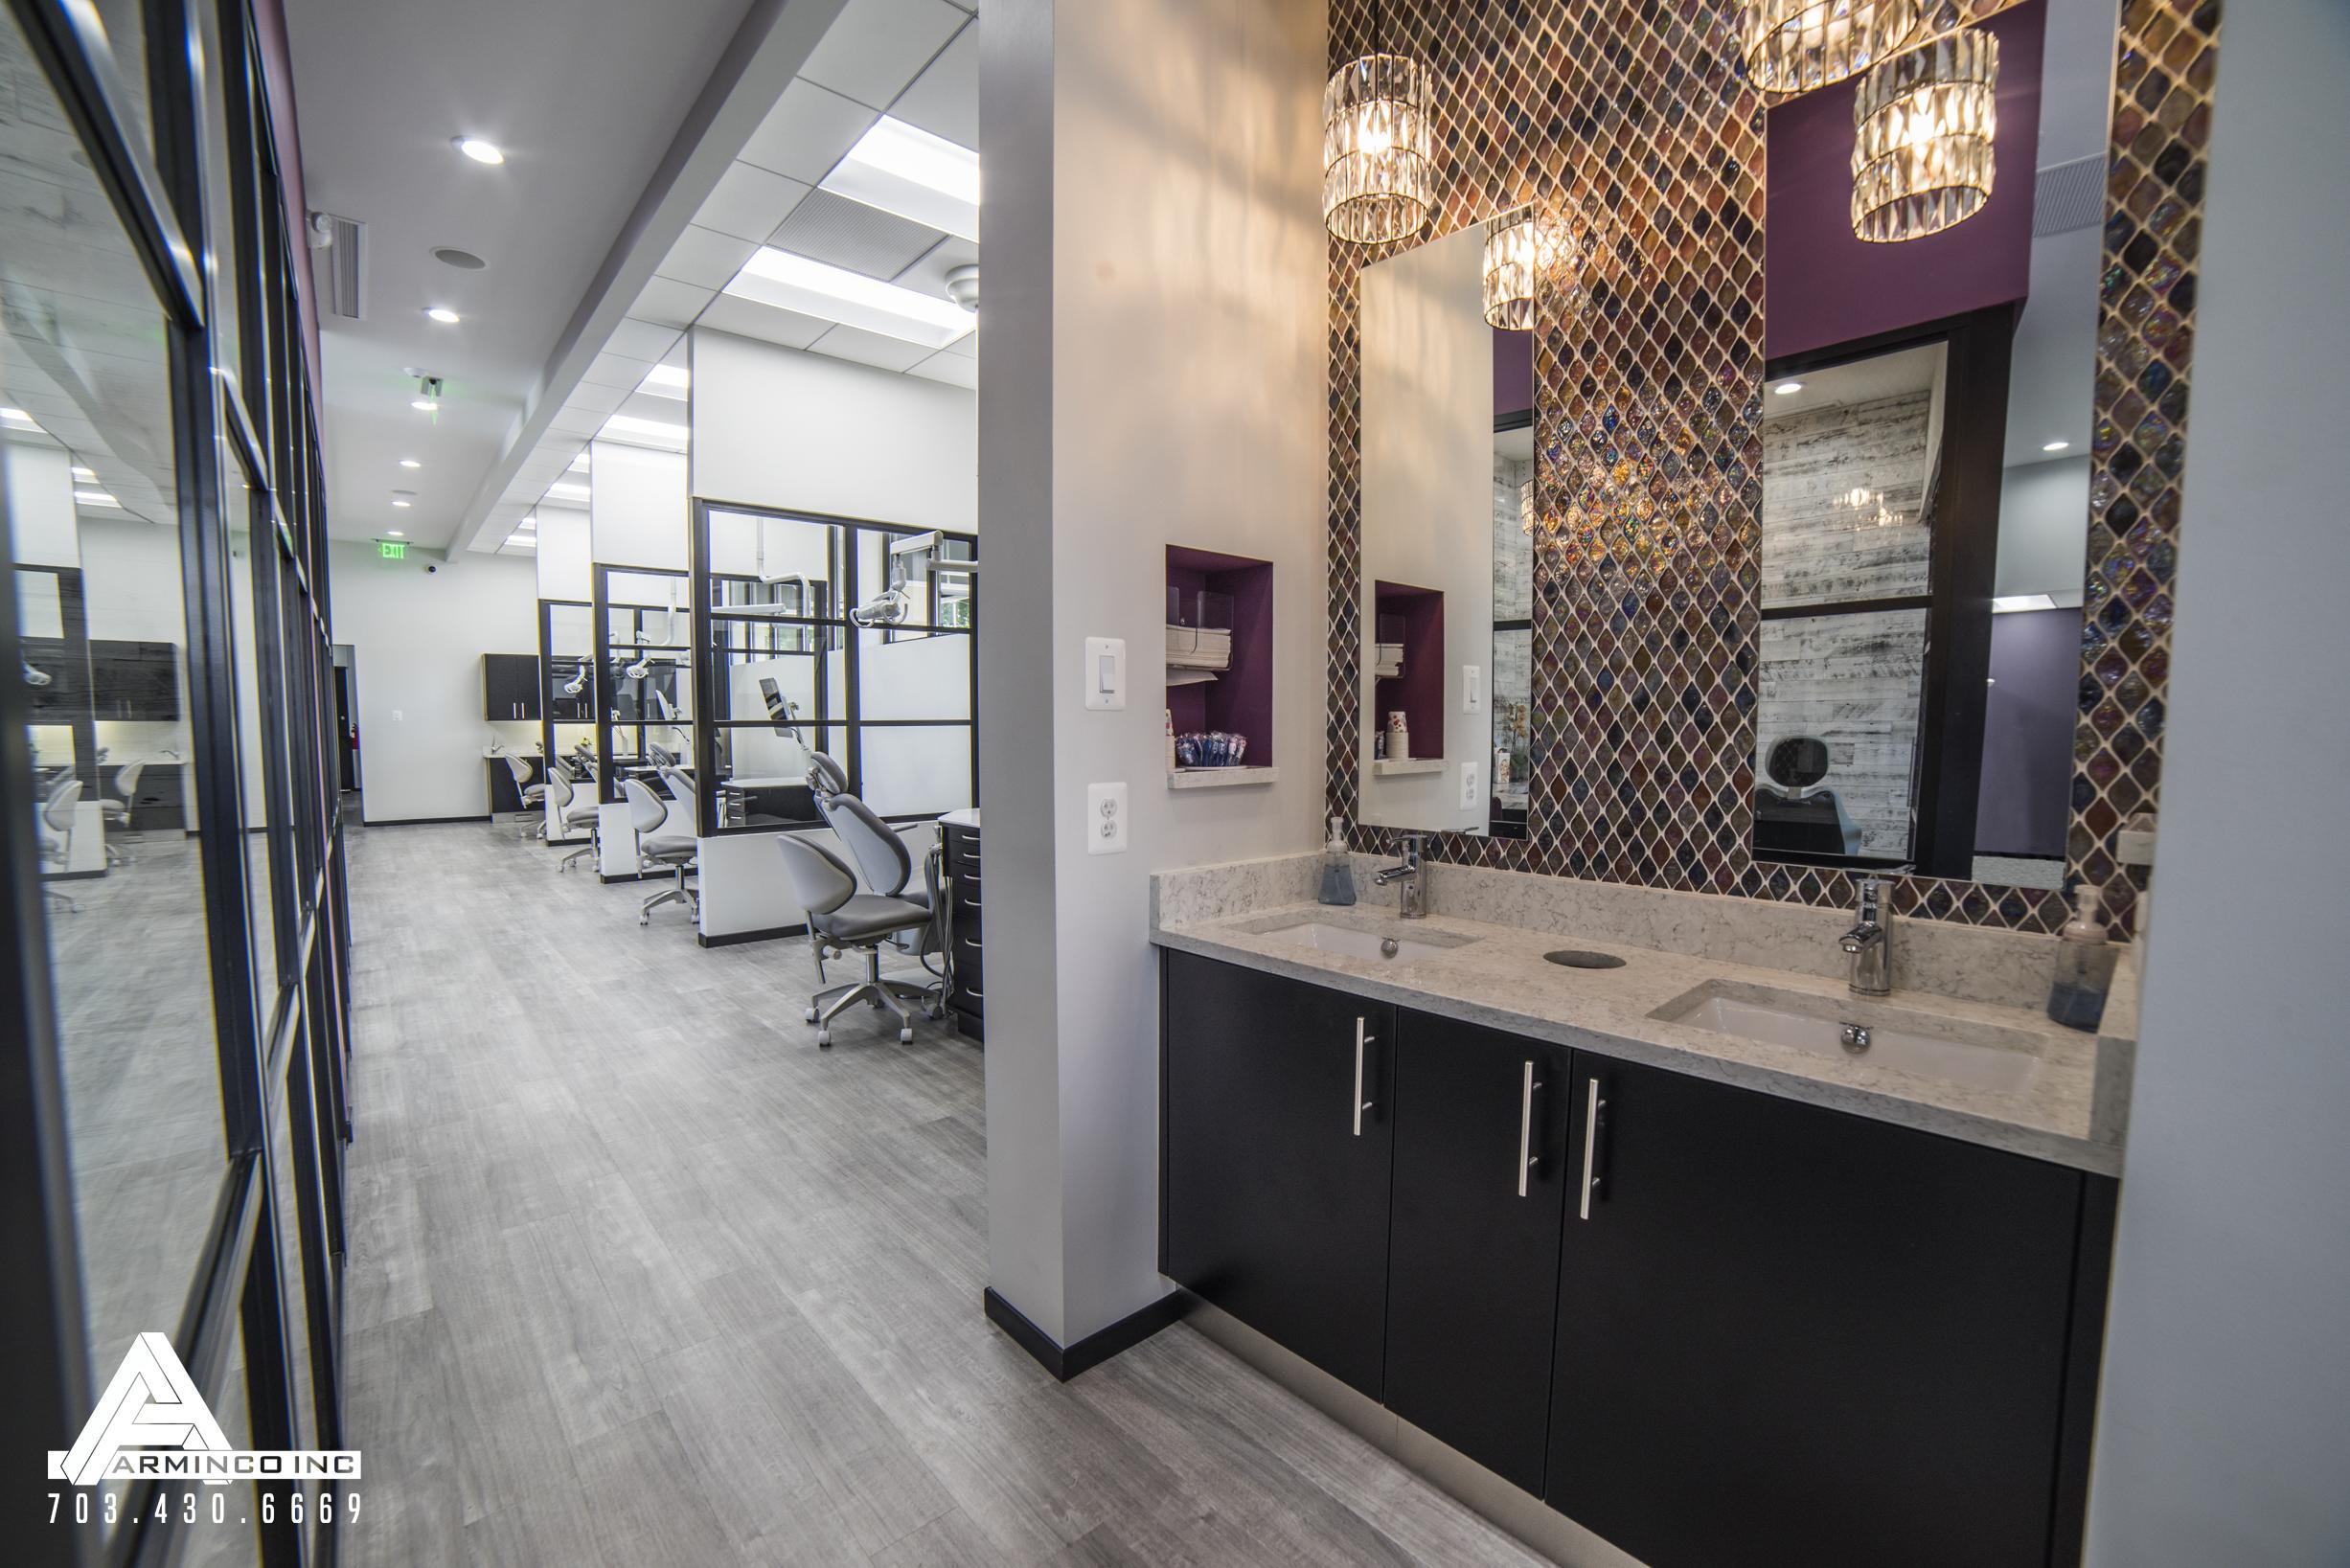 dental office design. Dental Office Design By Arminco Inc.